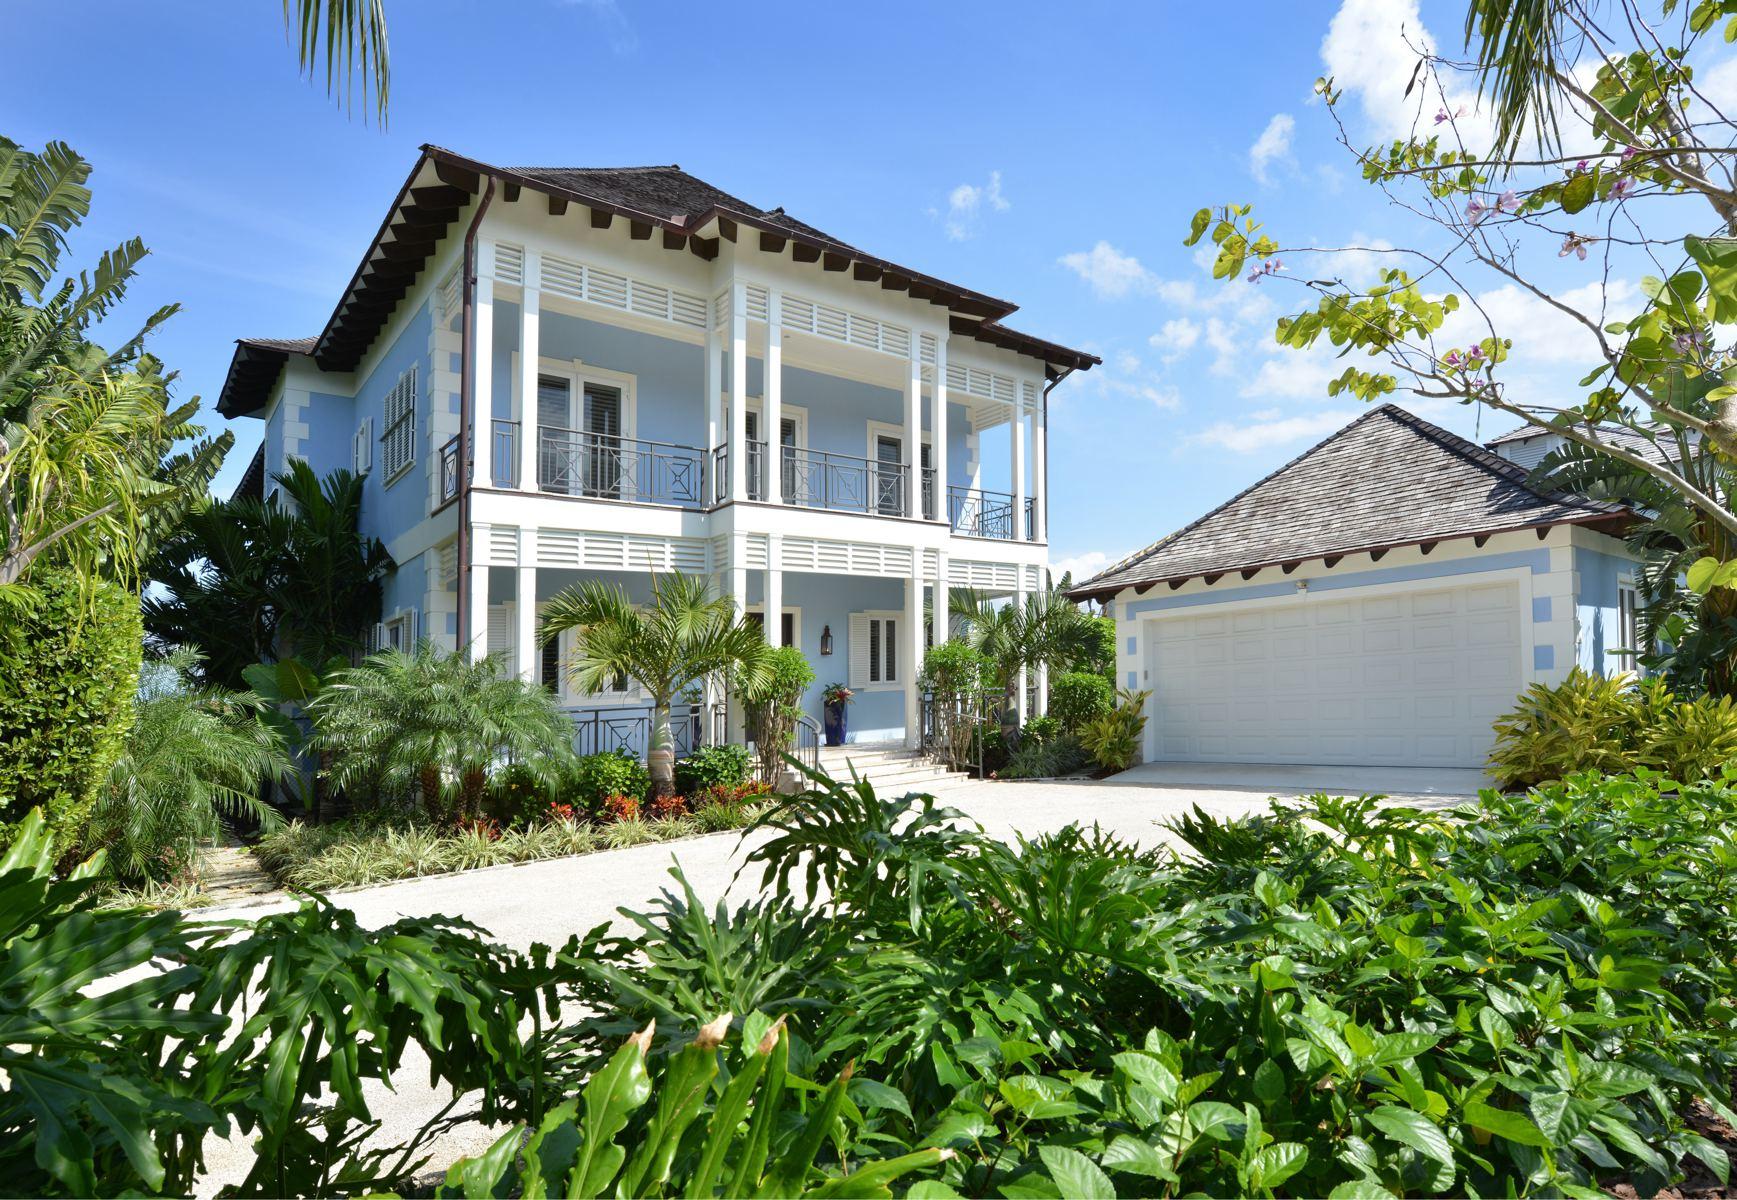 Maison unifamiliale pour l Vente à Blue Agave, Old Fort Bay Old Fort Bay, New Providence/Nassau Bahamas